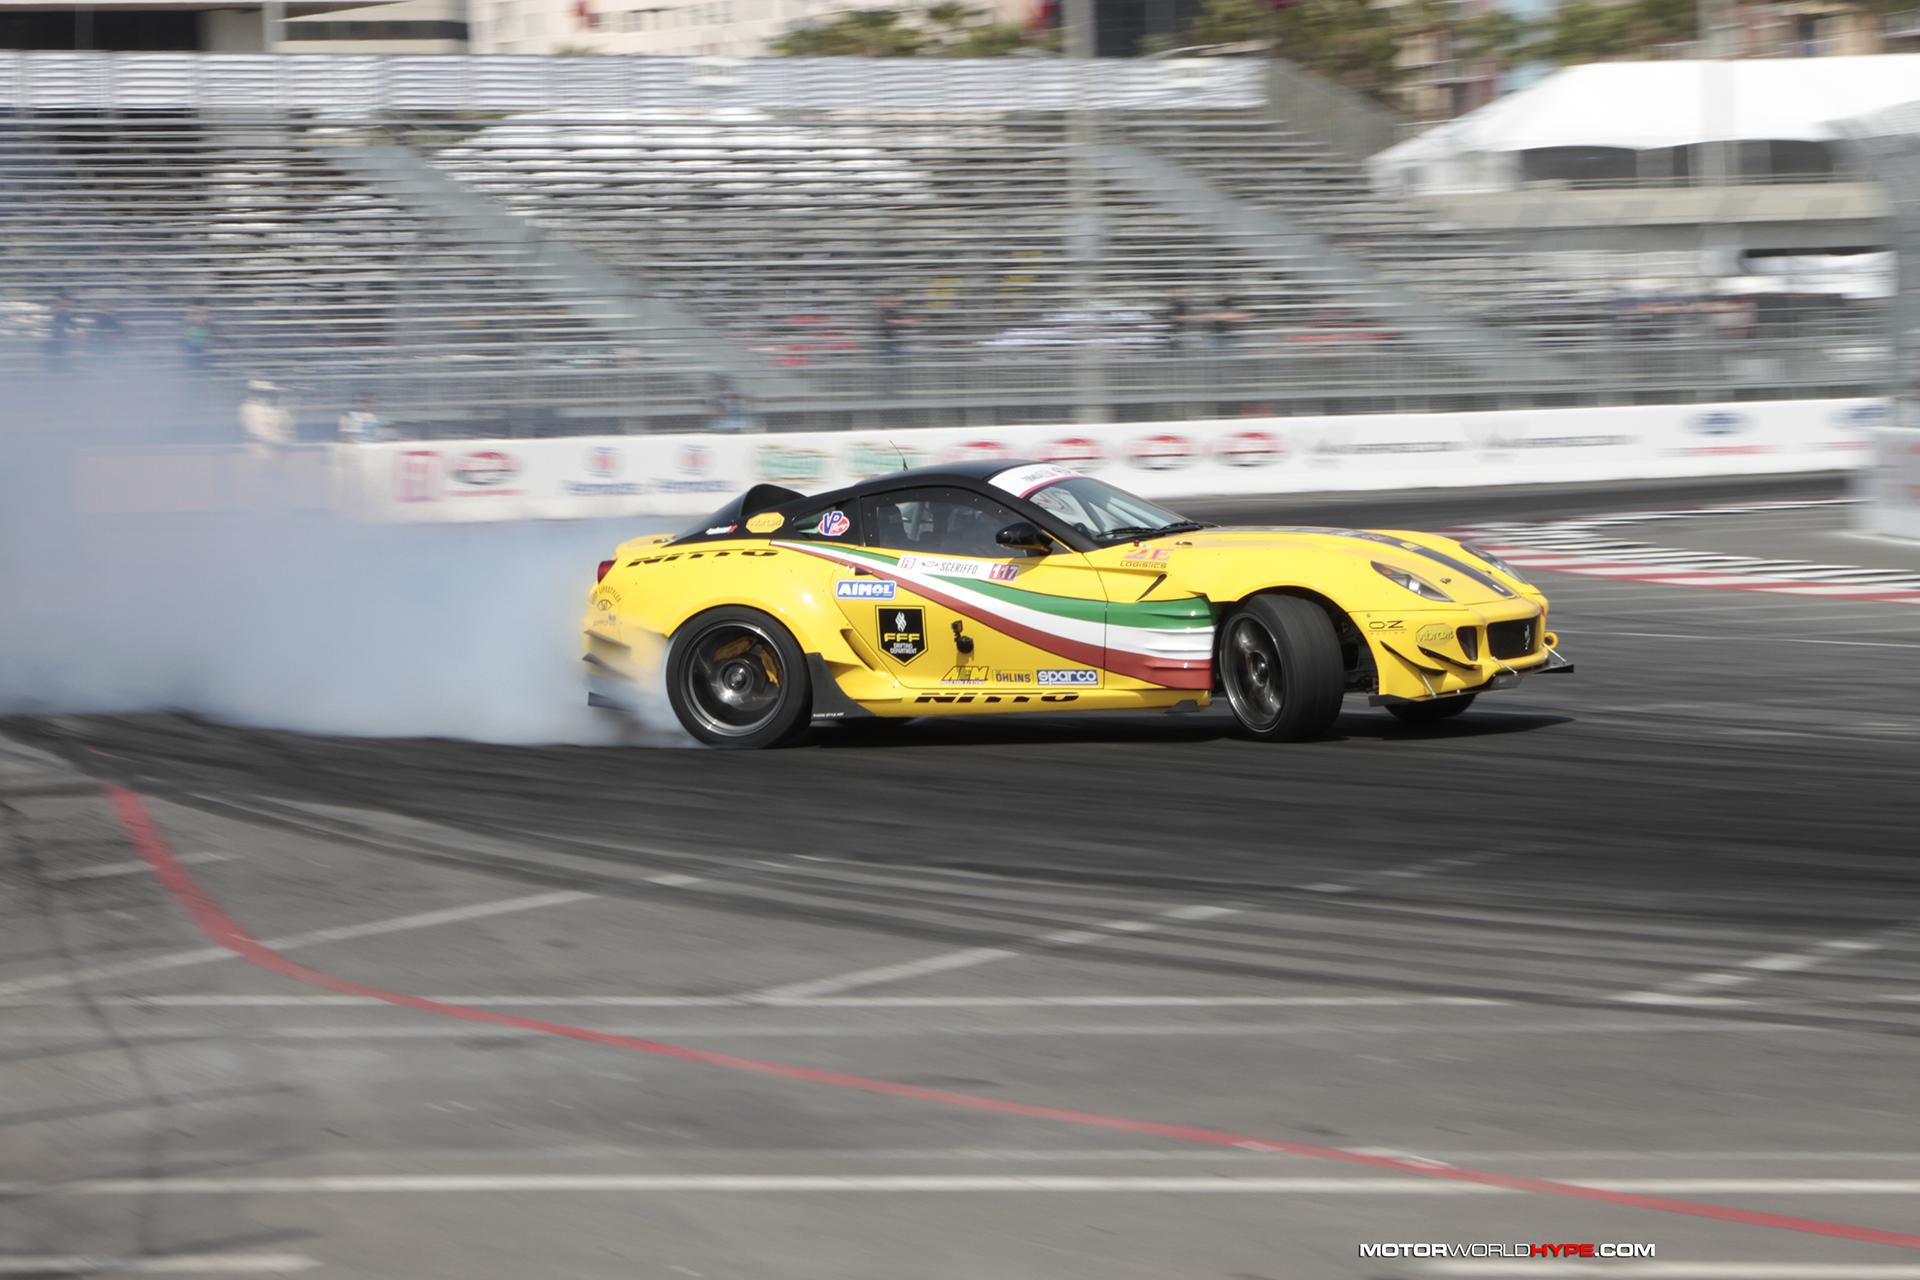 The Story Behind The Ferrari Drift Car Fire At Formula D Long Beach Motorworldhype